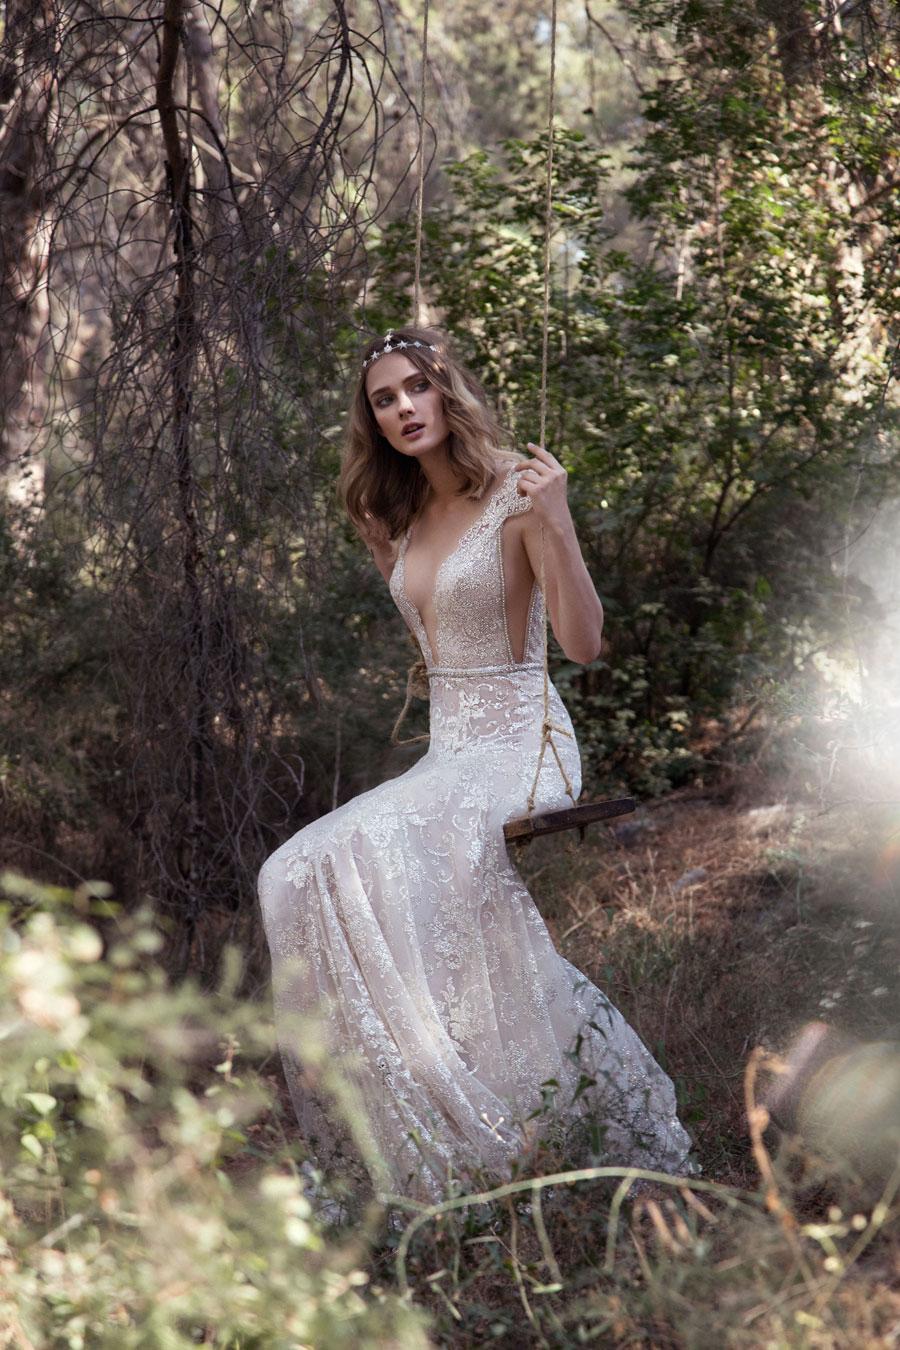 Wedding Dresses for the Urban-Boho Bride- Gala Collection No. IV0012